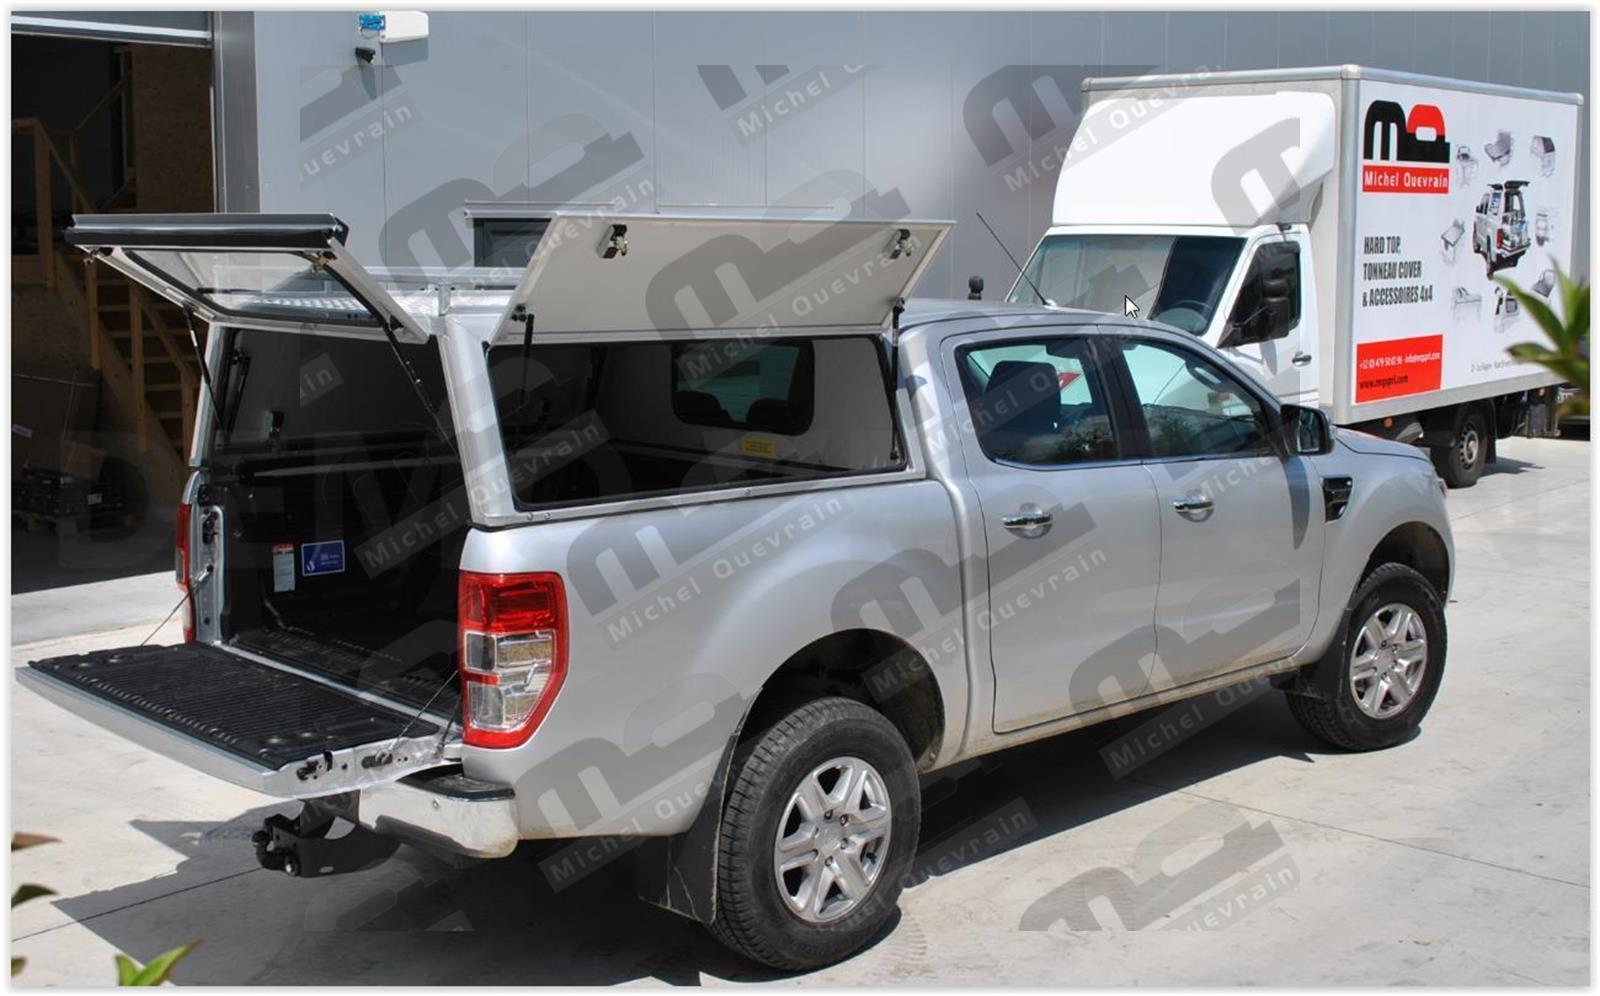 aluminium hard top ford ranger dc 2012. Black Bedroom Furniture Sets. Home Design Ideas